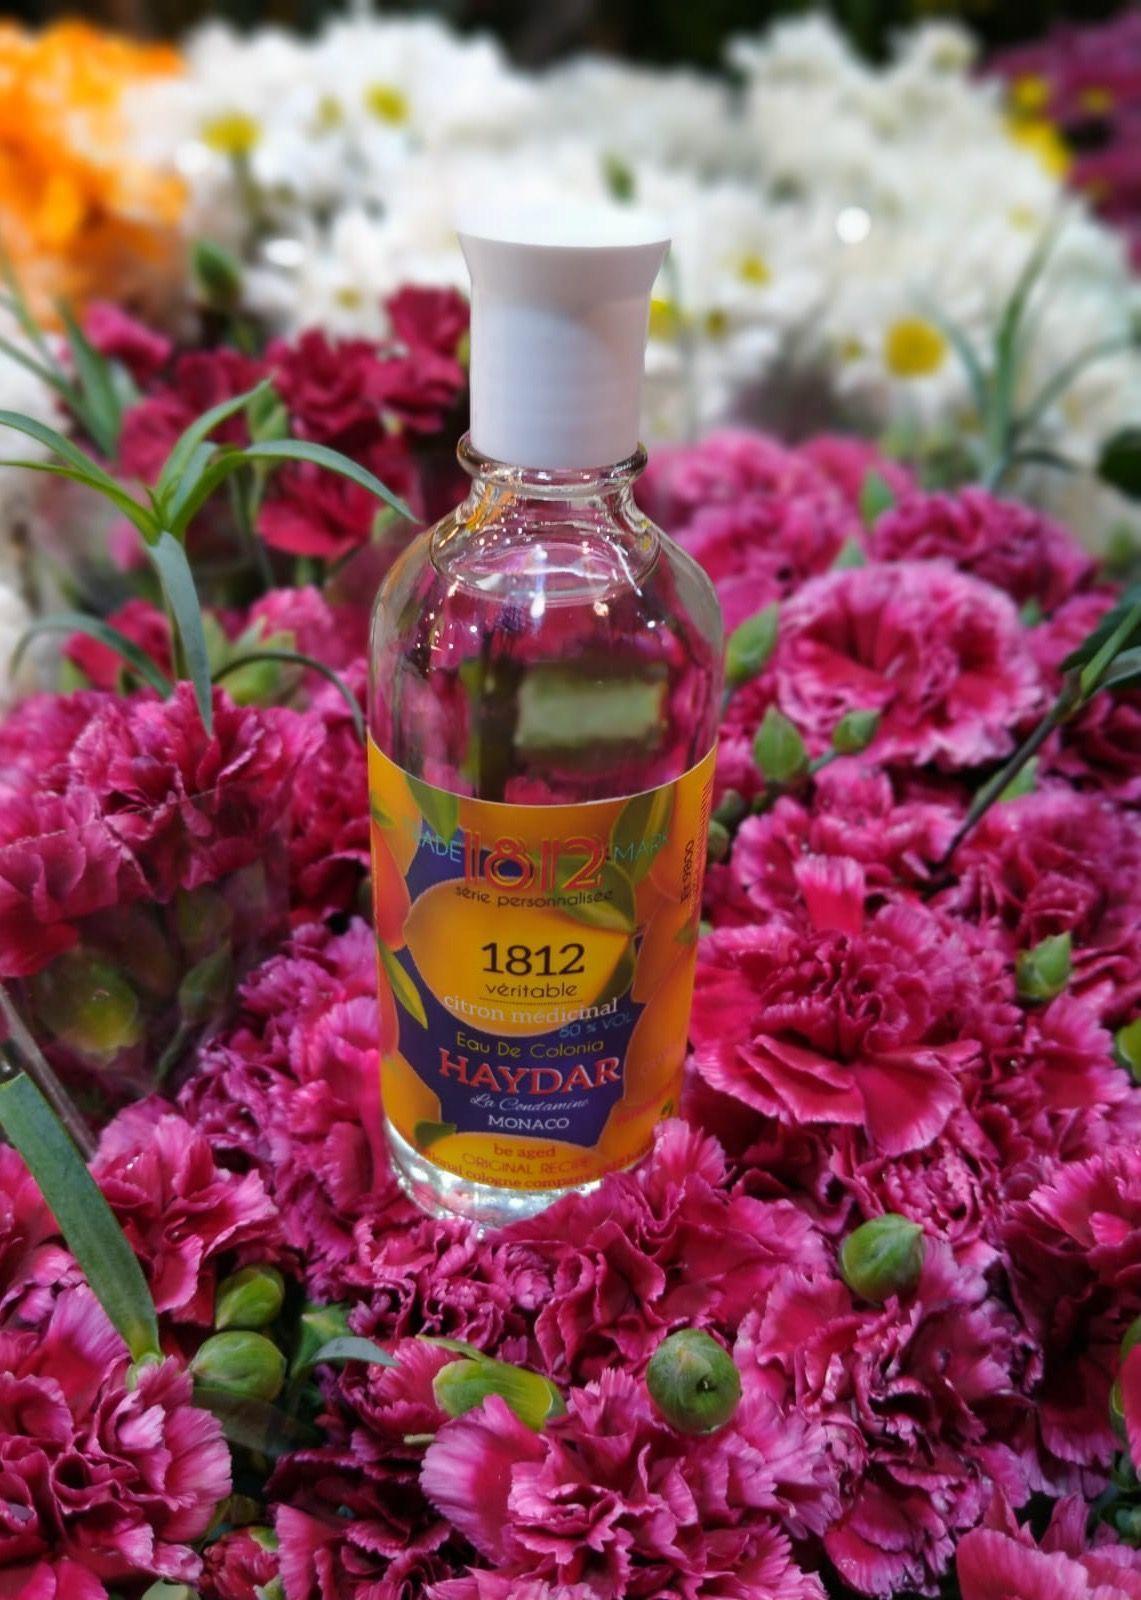 Pin On Fragrances 1812